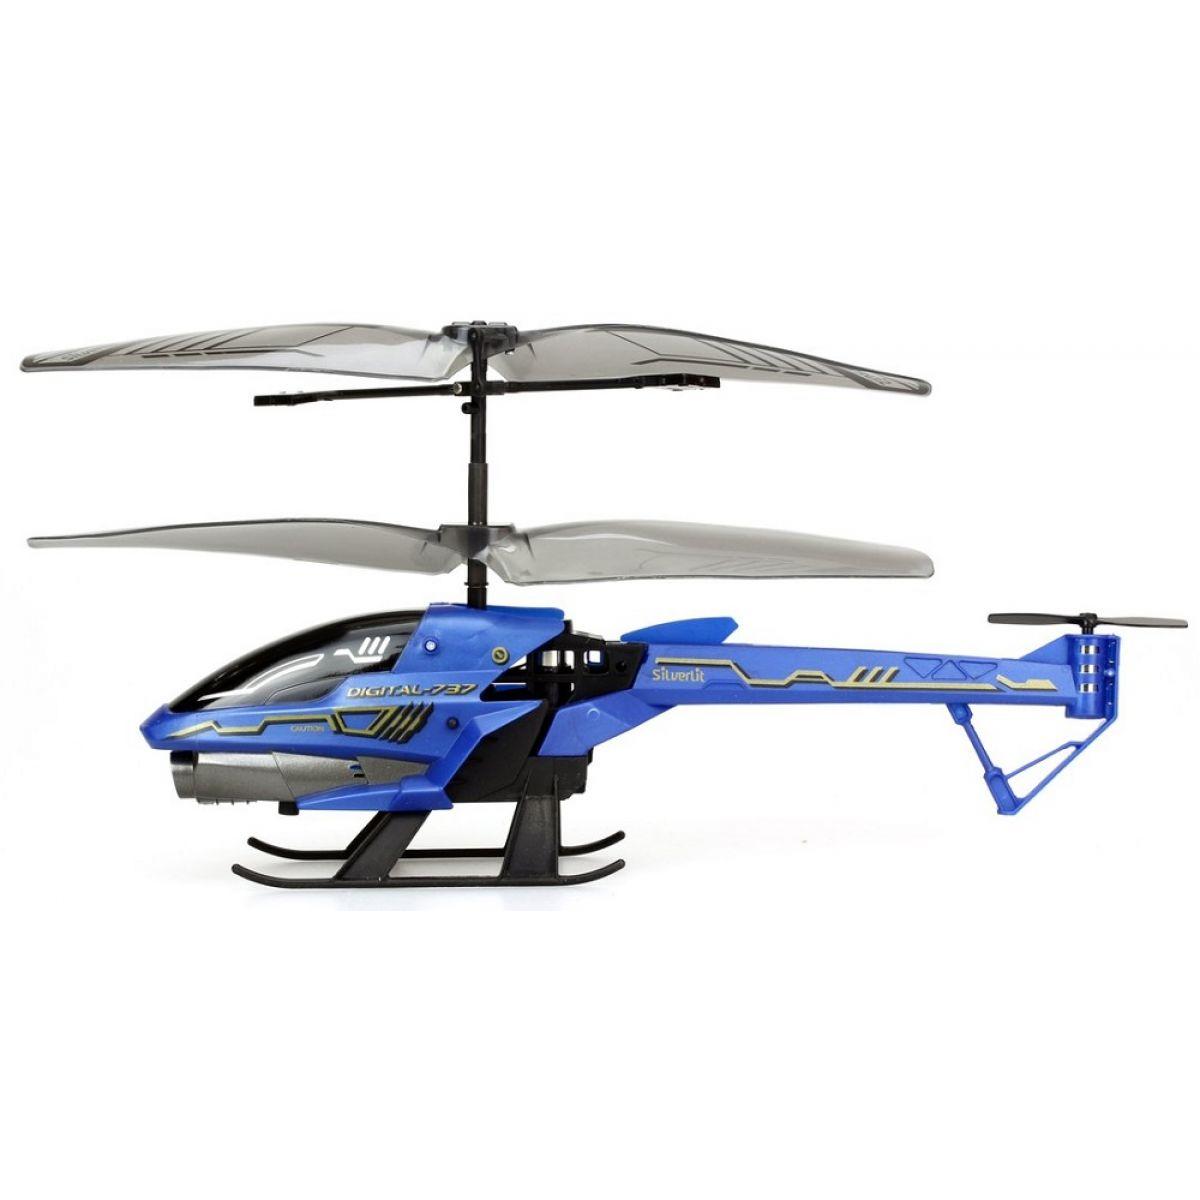 SILVERLIT RC helikoptéra Spy Cam III s kamerou modrá